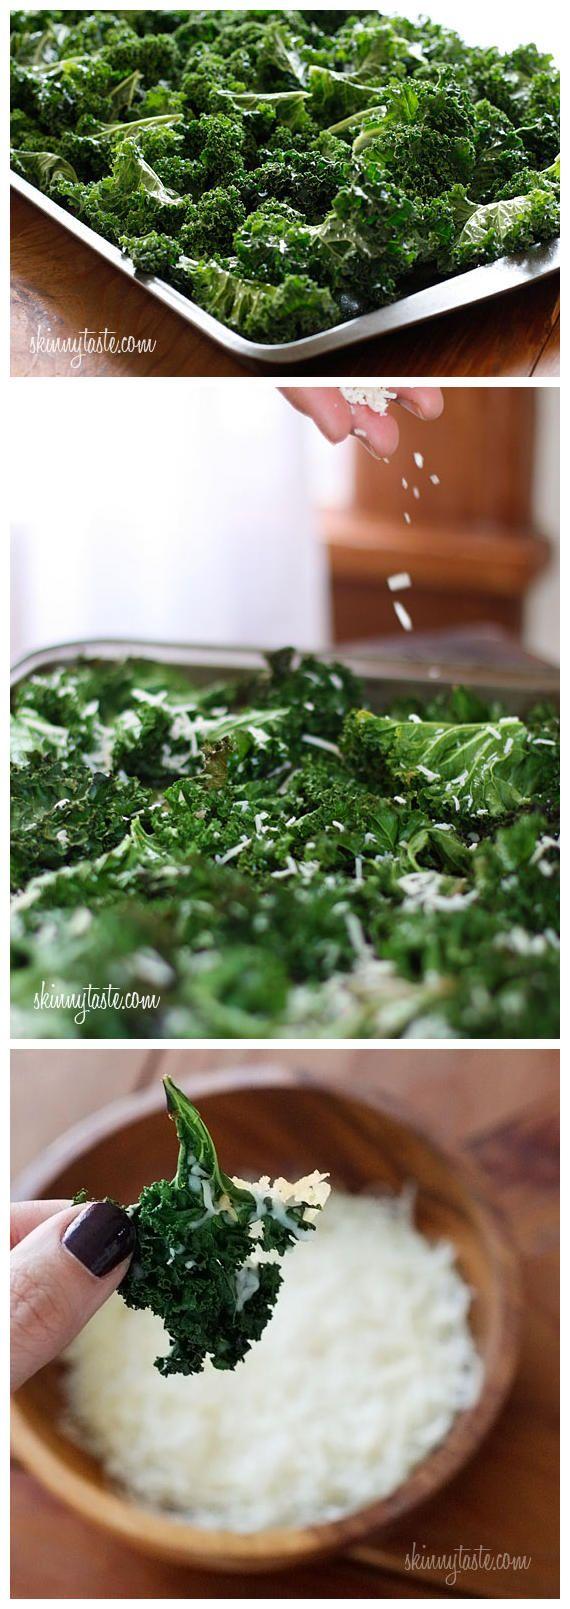 toptenlook: Baked Parmesan Kale Chips | Foodie | Pinterest